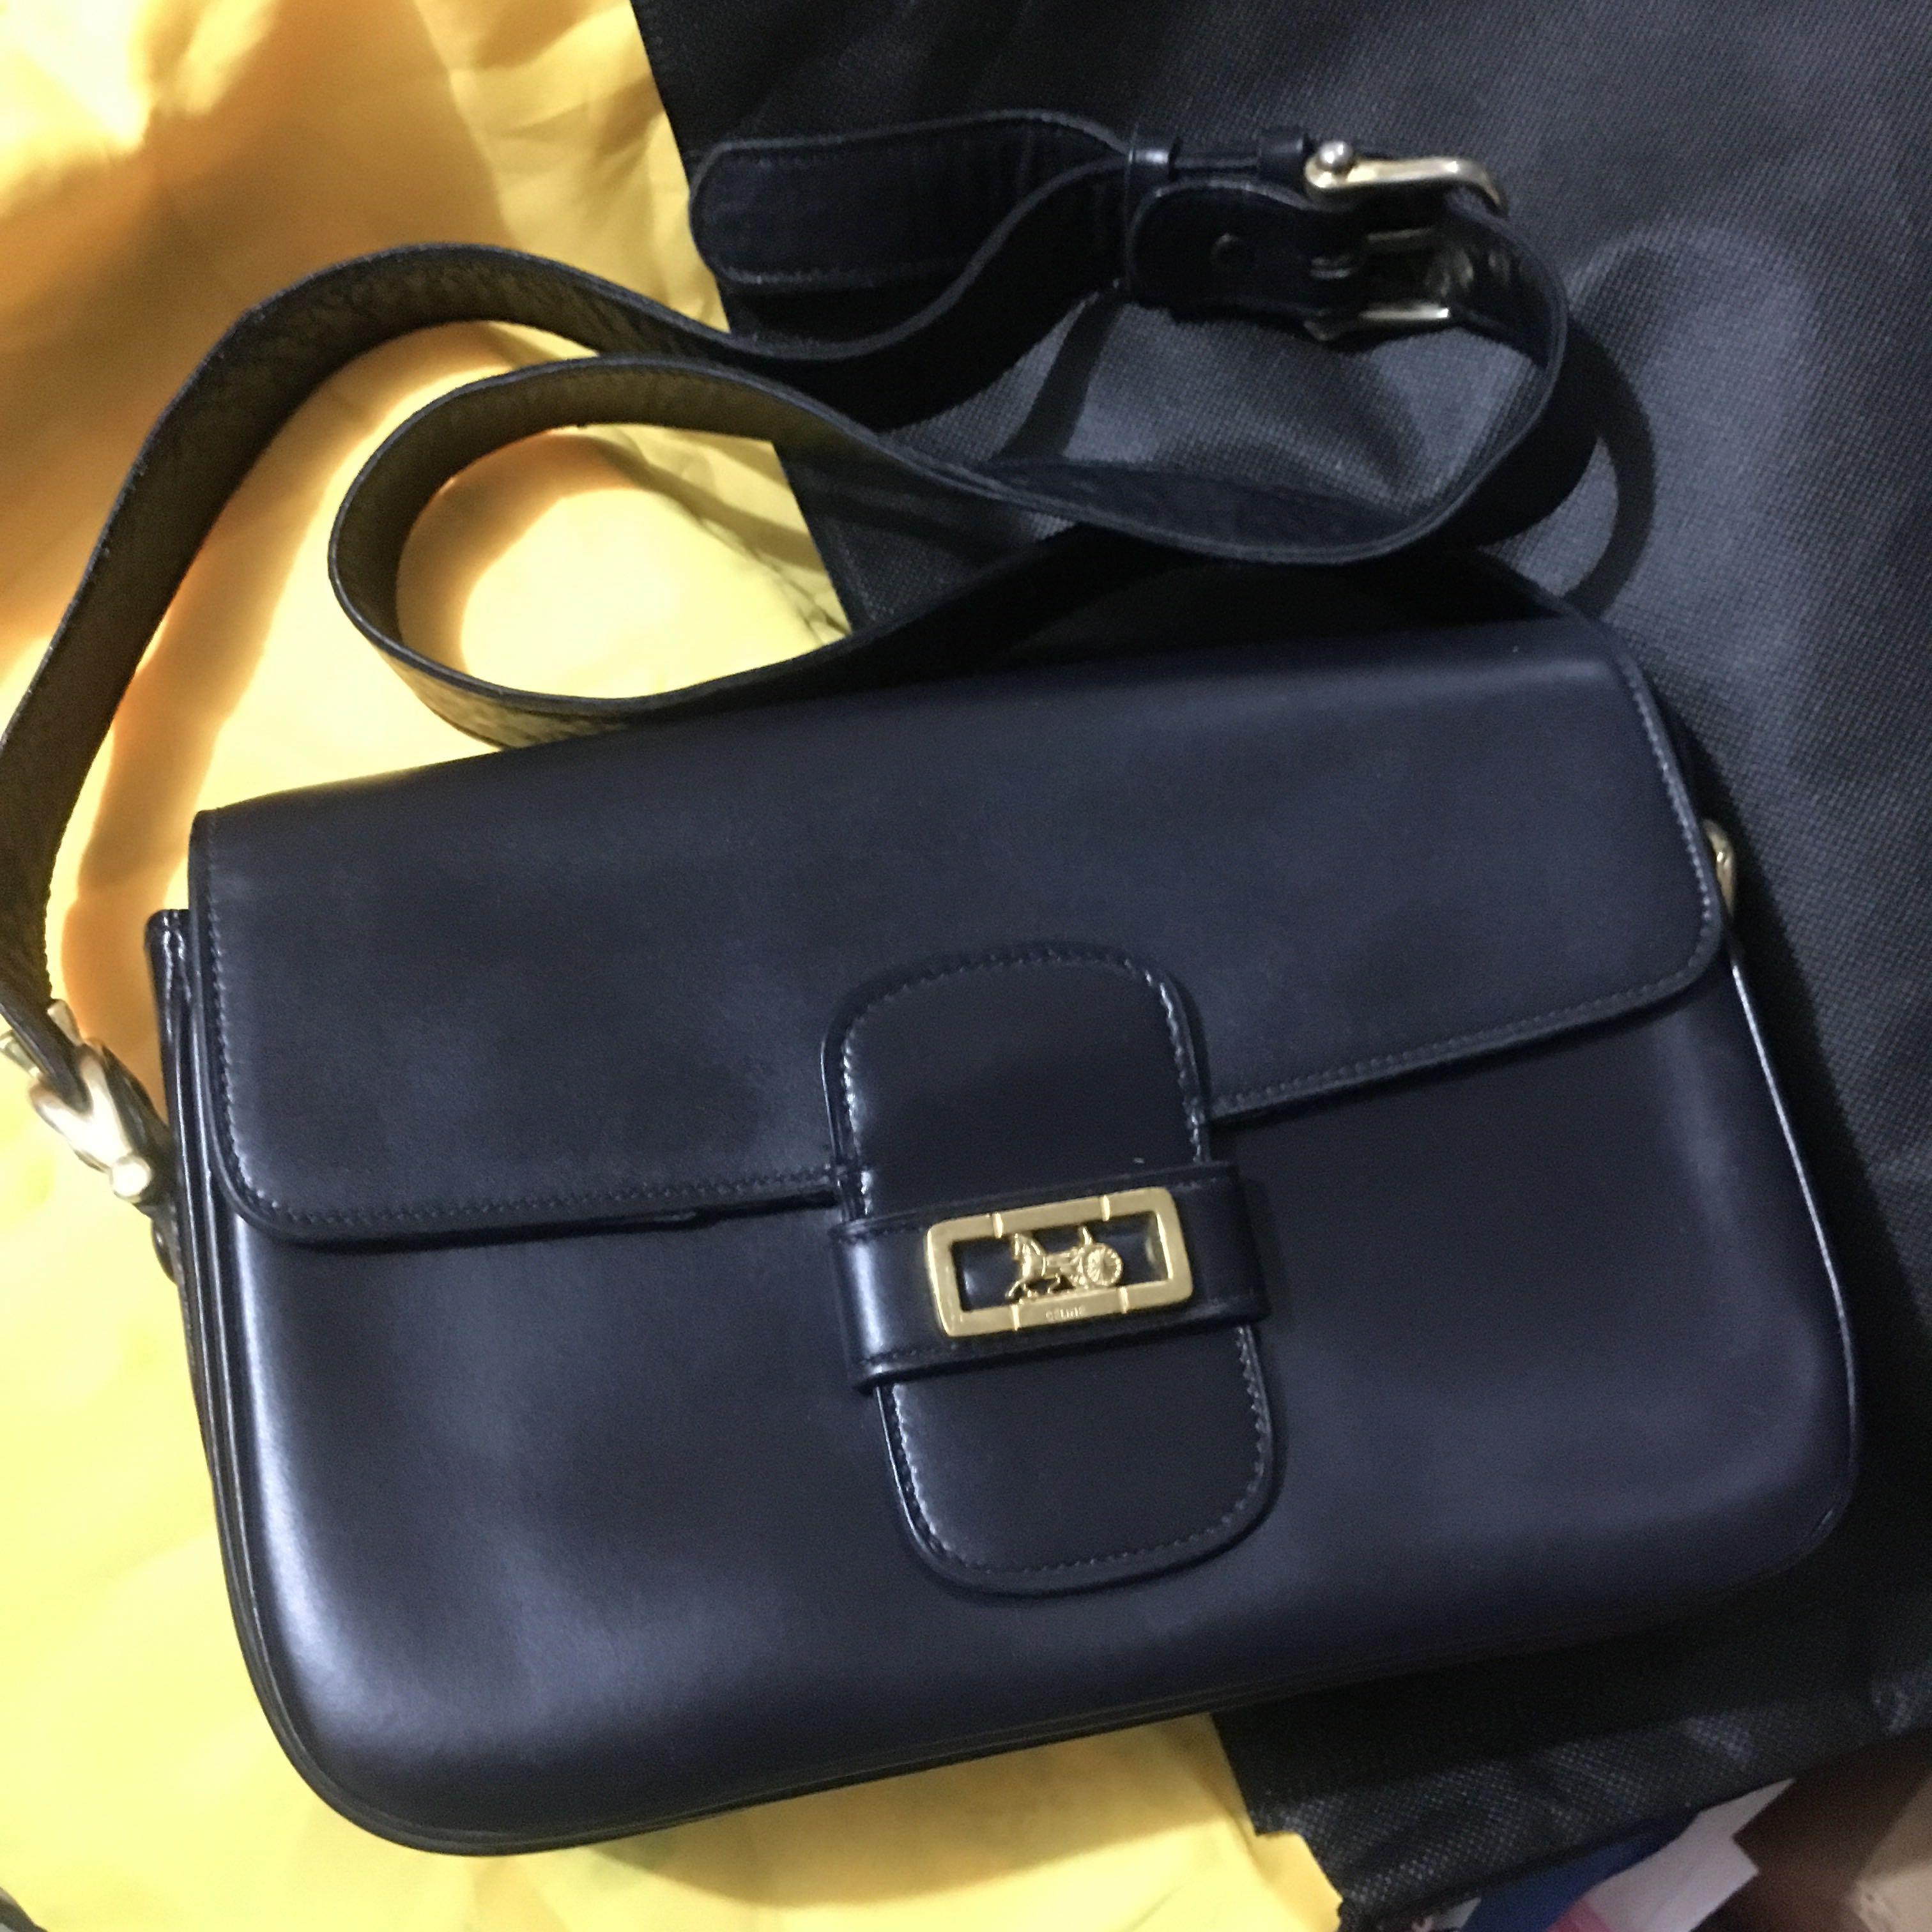 深藍色 celine 馬車 Navy carriage shoulder bag vintage 中古牛皮 斜孭袋款